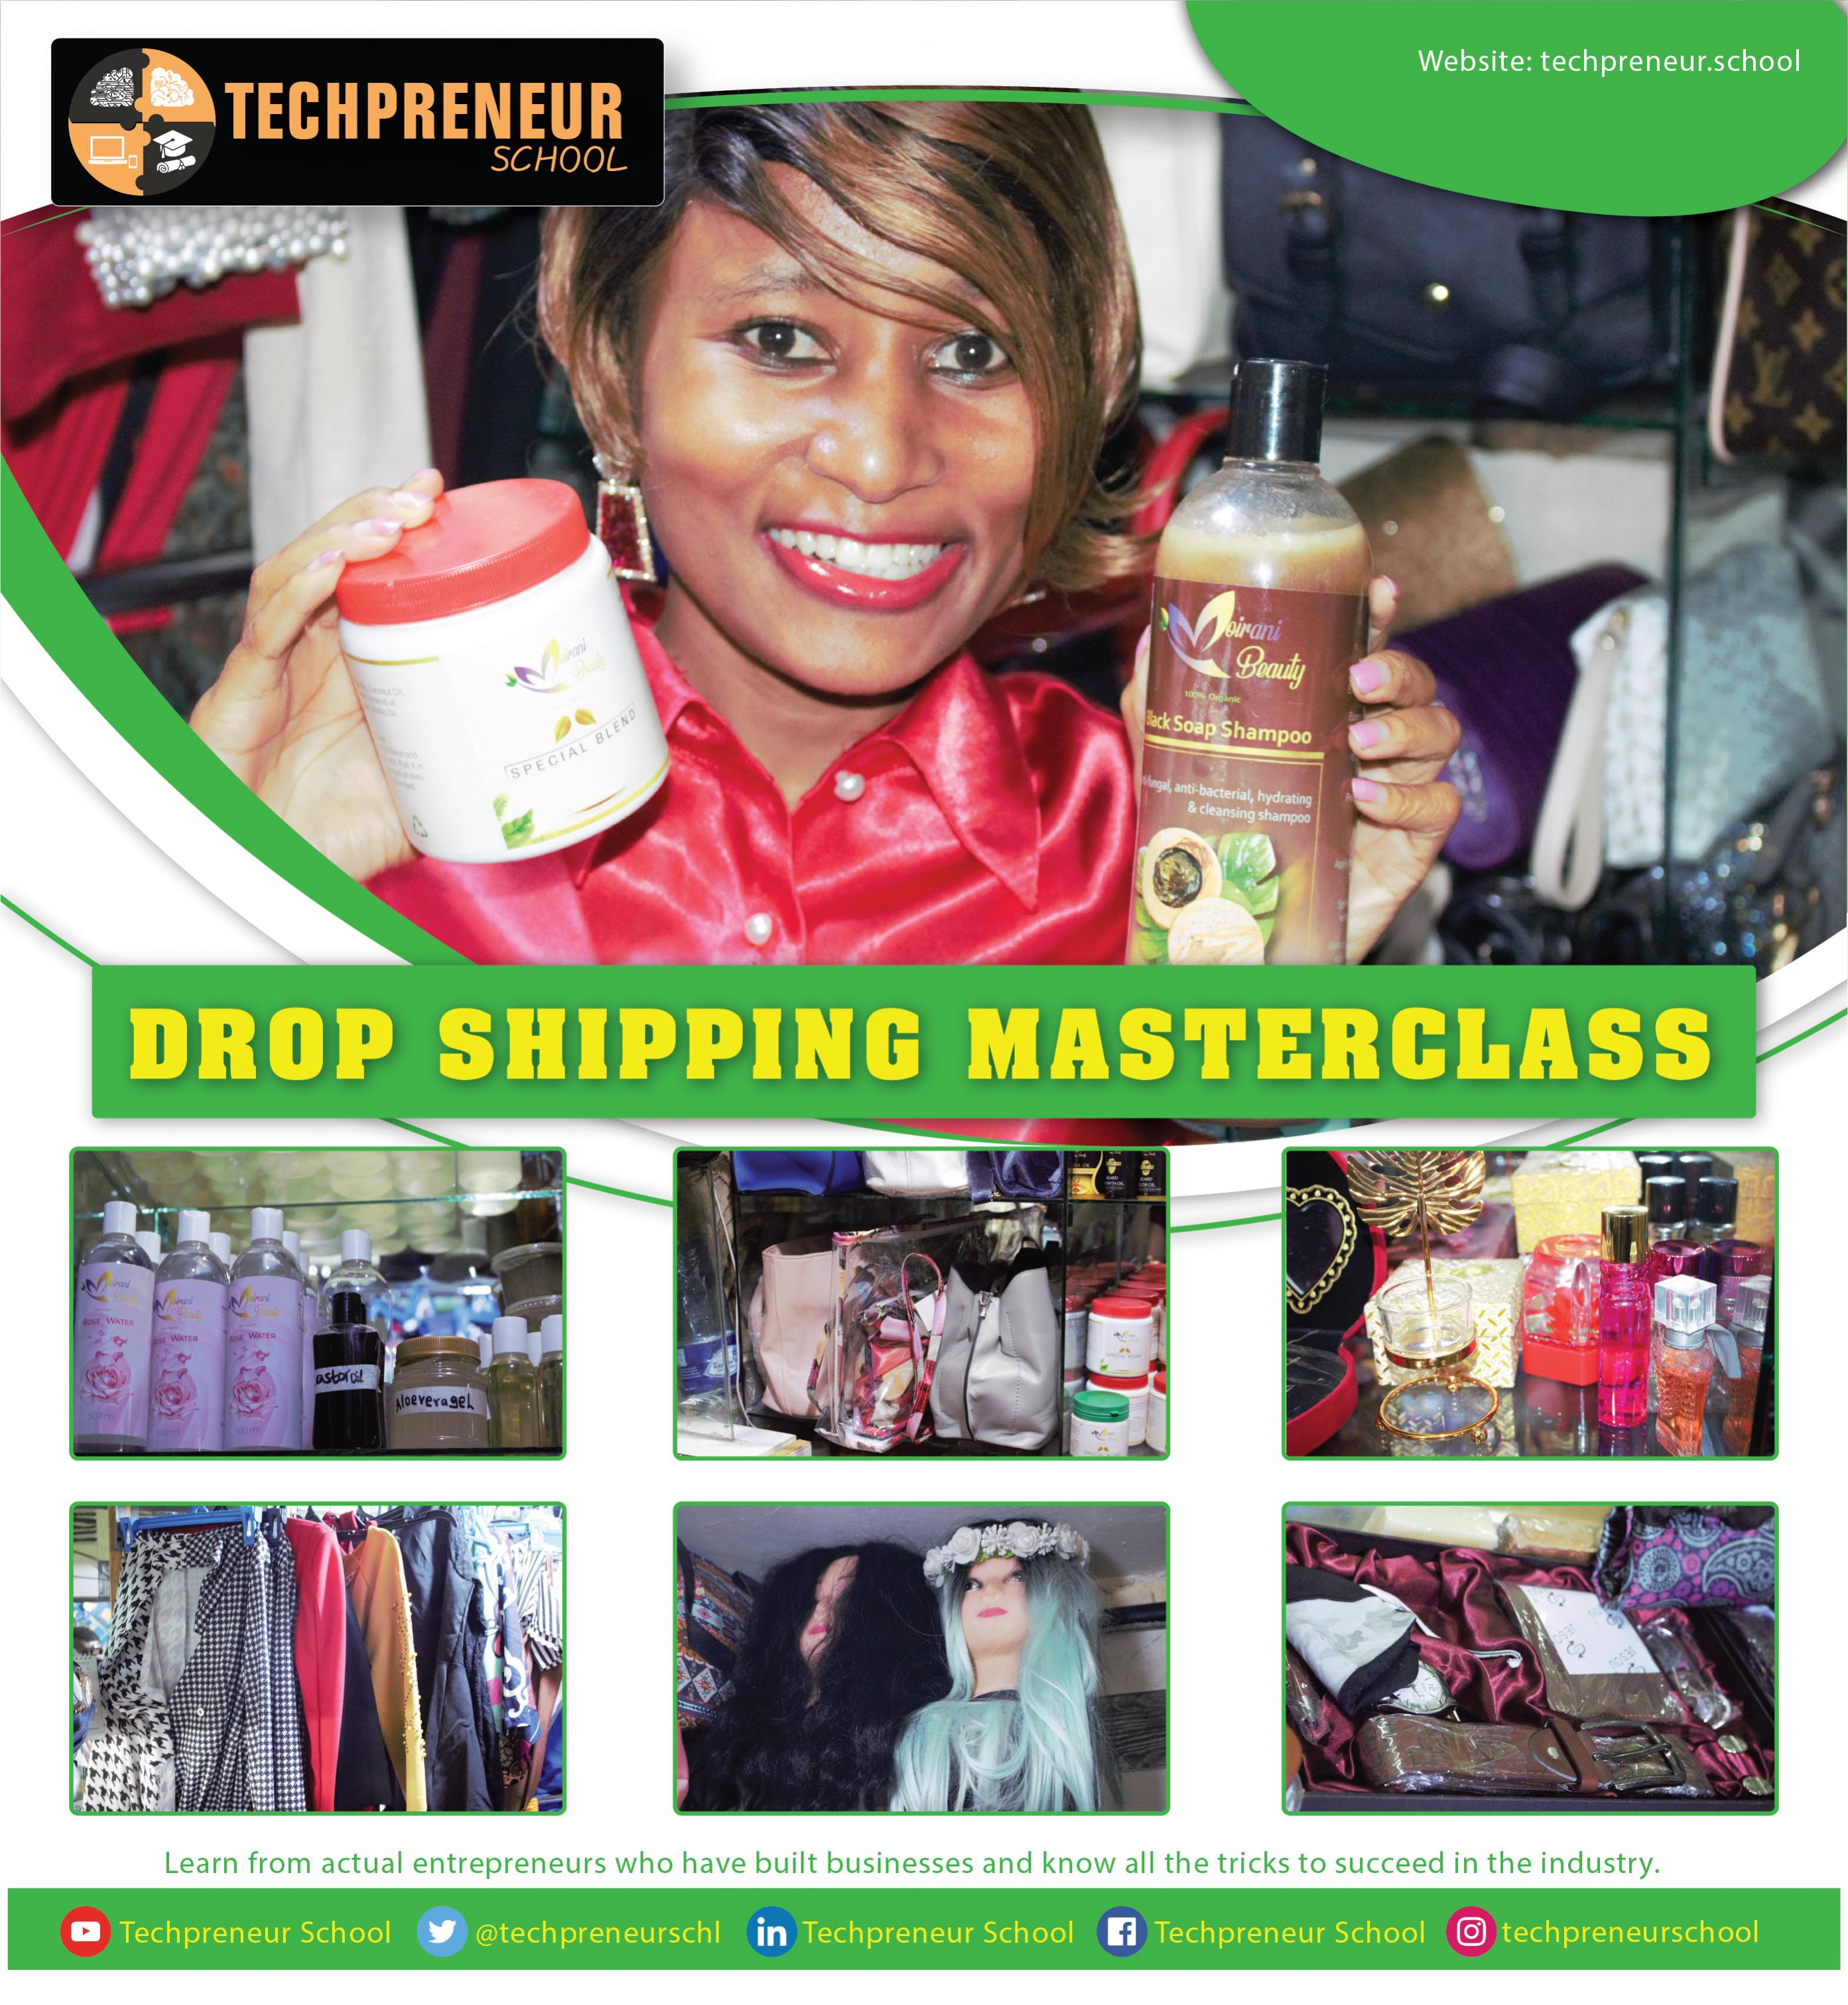 Drop Shipping Masterclass Poster